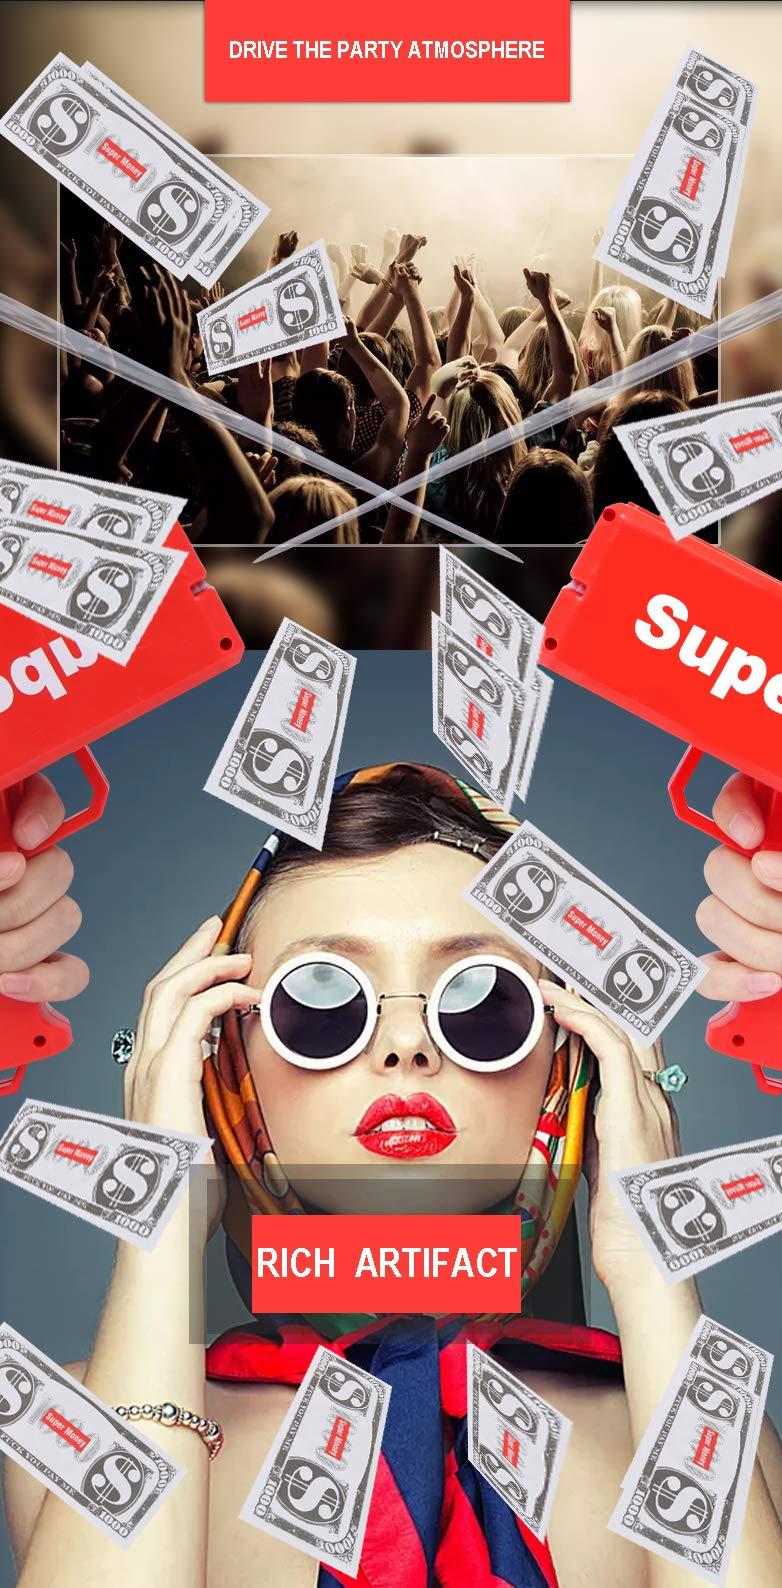 Sopu Make it Rain Money Gun Paper Playing Spary Money Toy Gun, Prop Money Gun with 100 Pcs Play Money Cash Gun Party Supplies (Money Gun) by Sopu (Image #8)